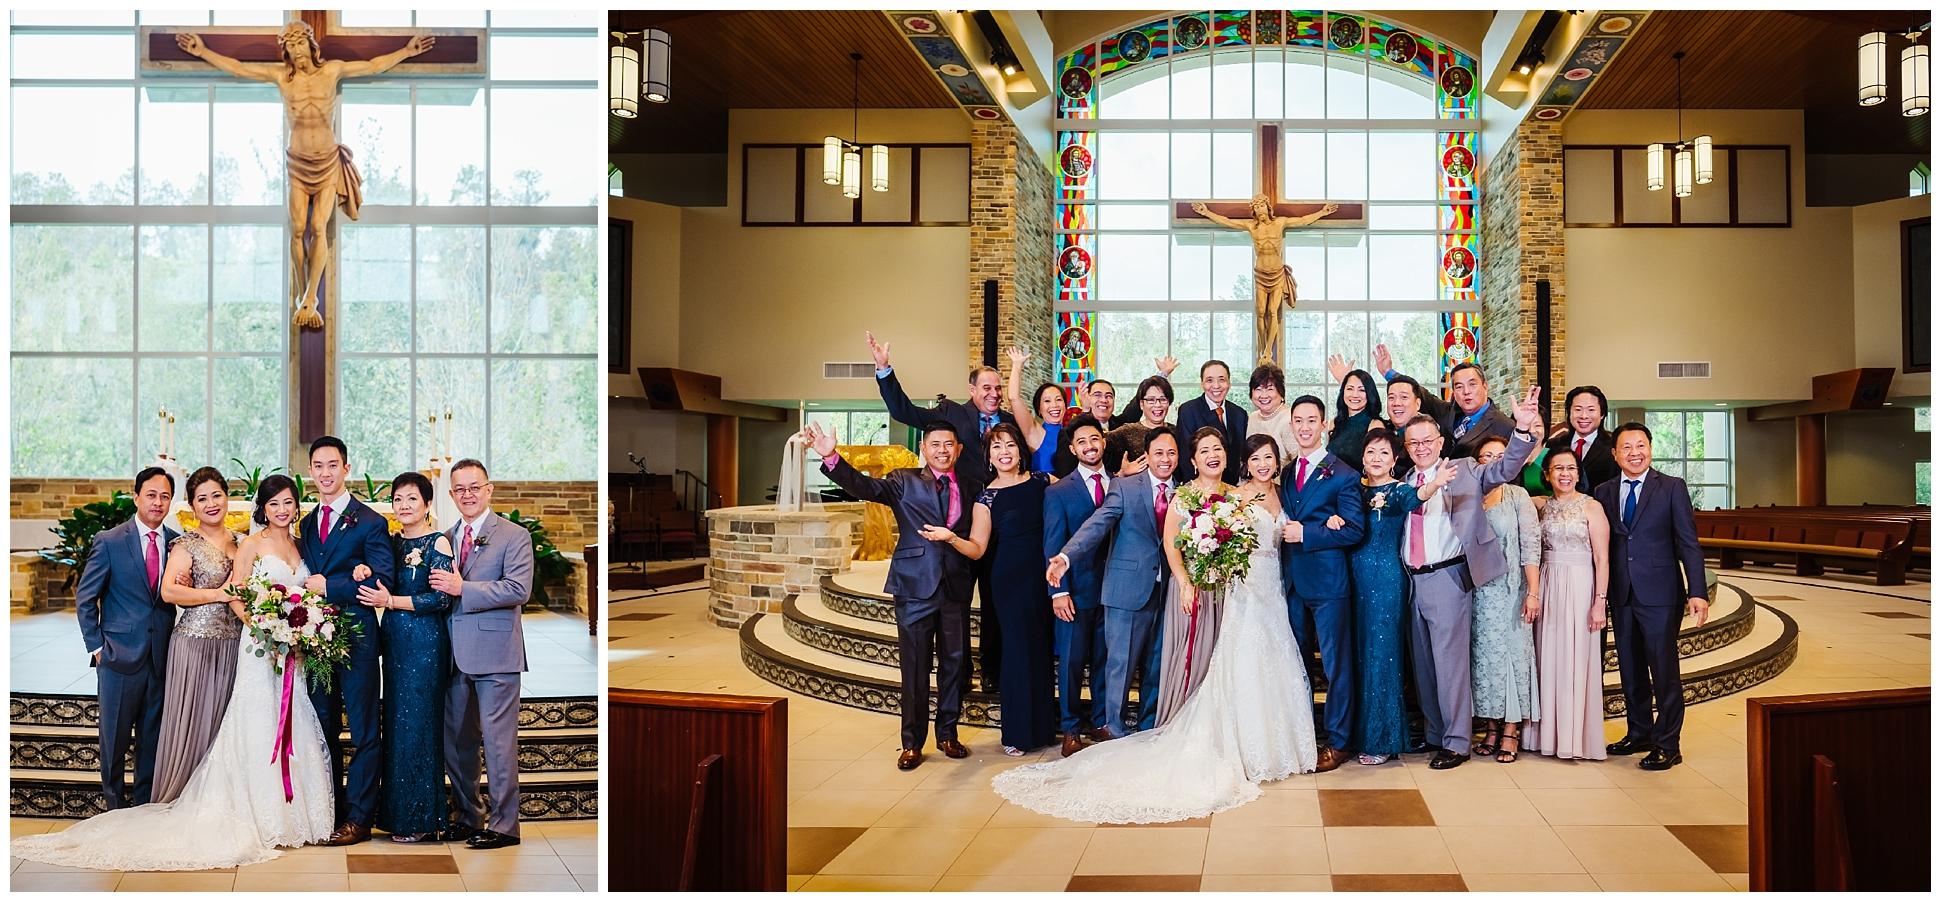 tampa-wedding-photographer-philipino-colorful-woods-ballroom-church-mass-confetti-fuscia_0040.jpg